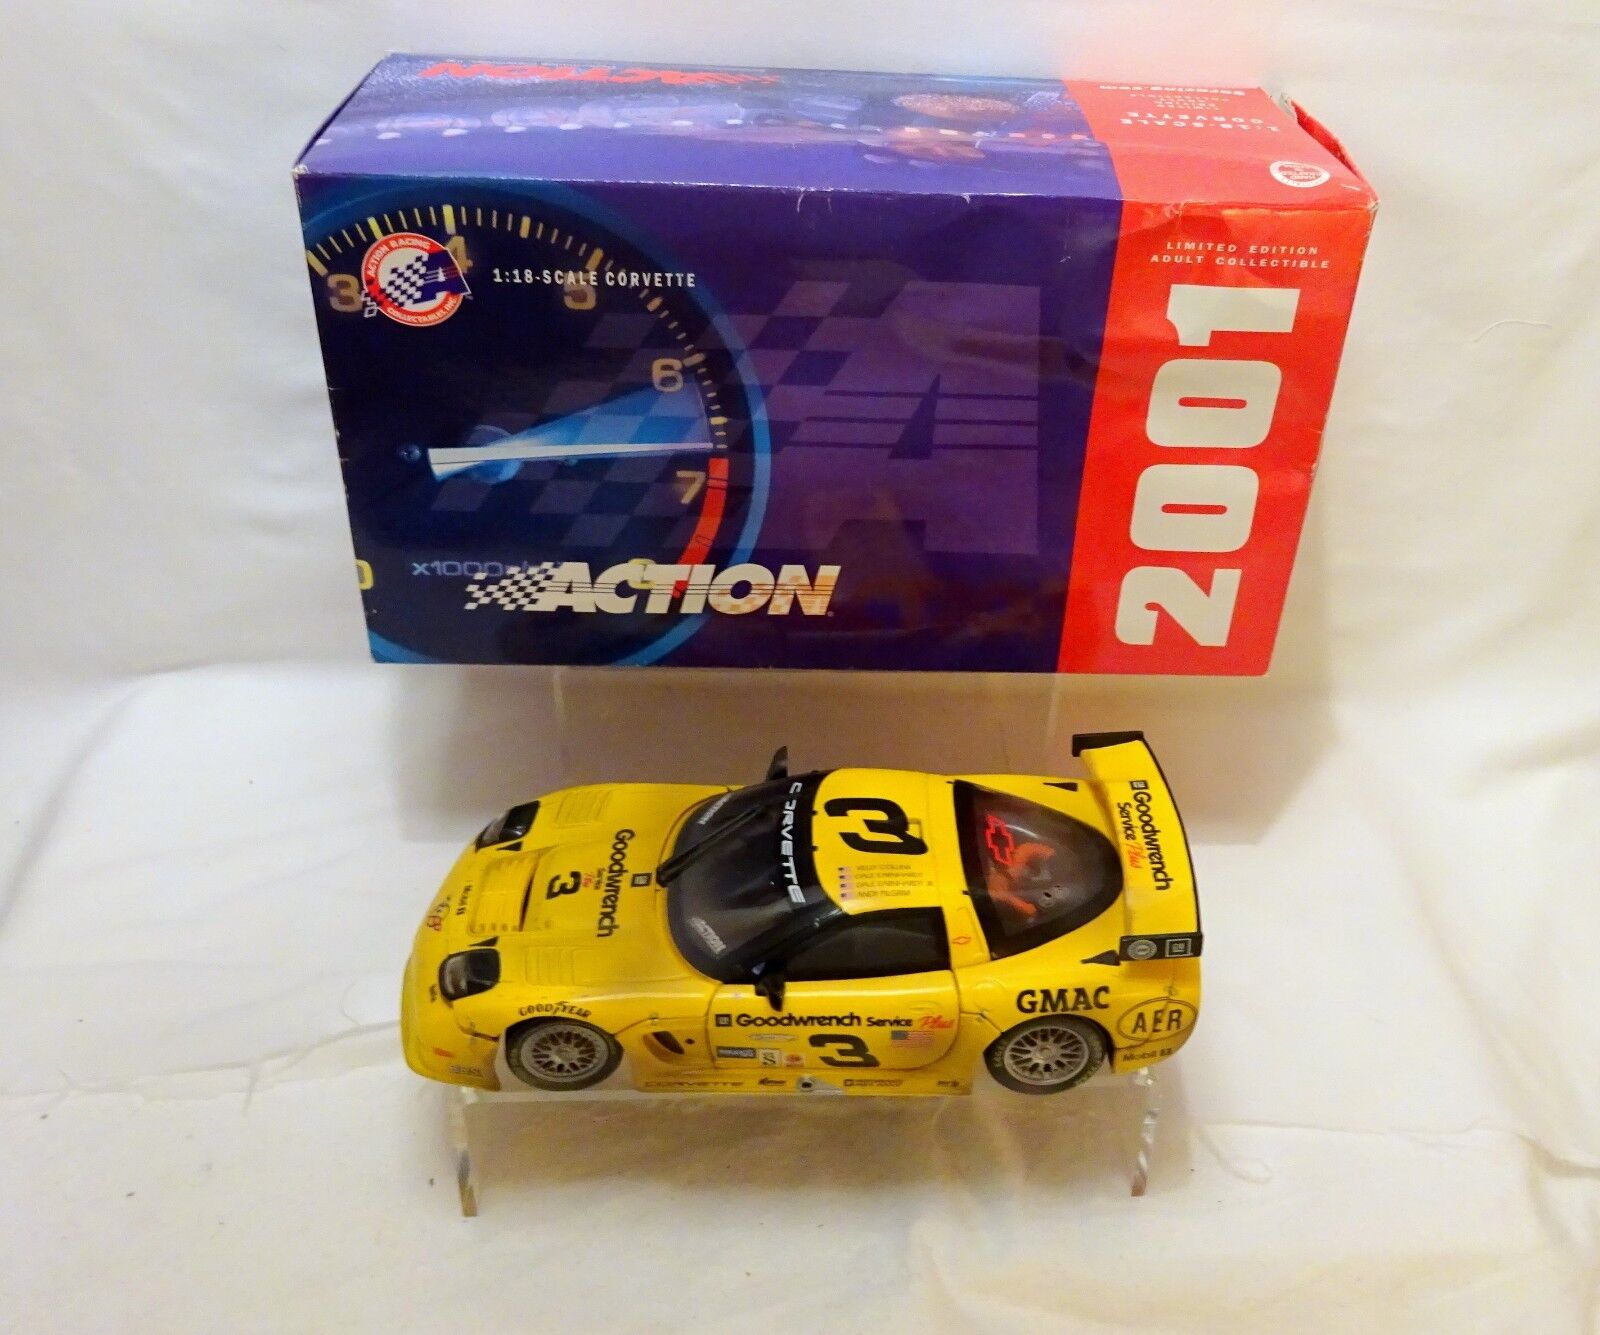 Earnhardt  Andy Pilgrim Kelly Collins Corvette 1 18 Action    (22)